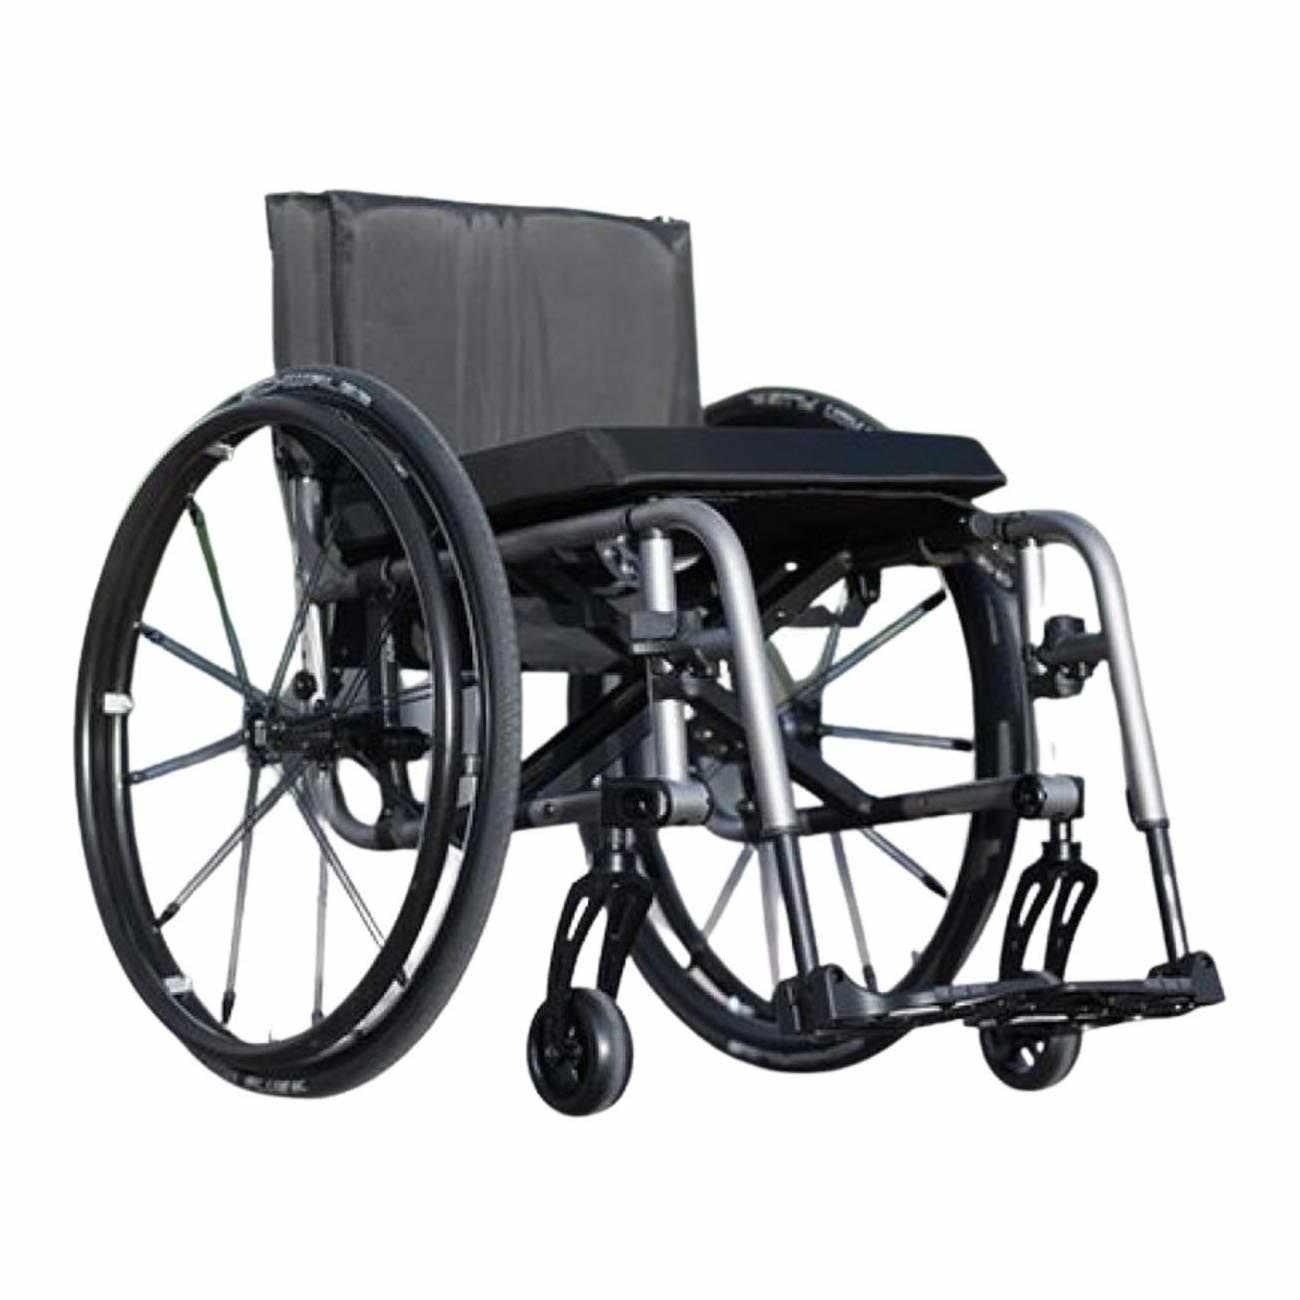 TiLite 2GX series folding ultralight wheelchair